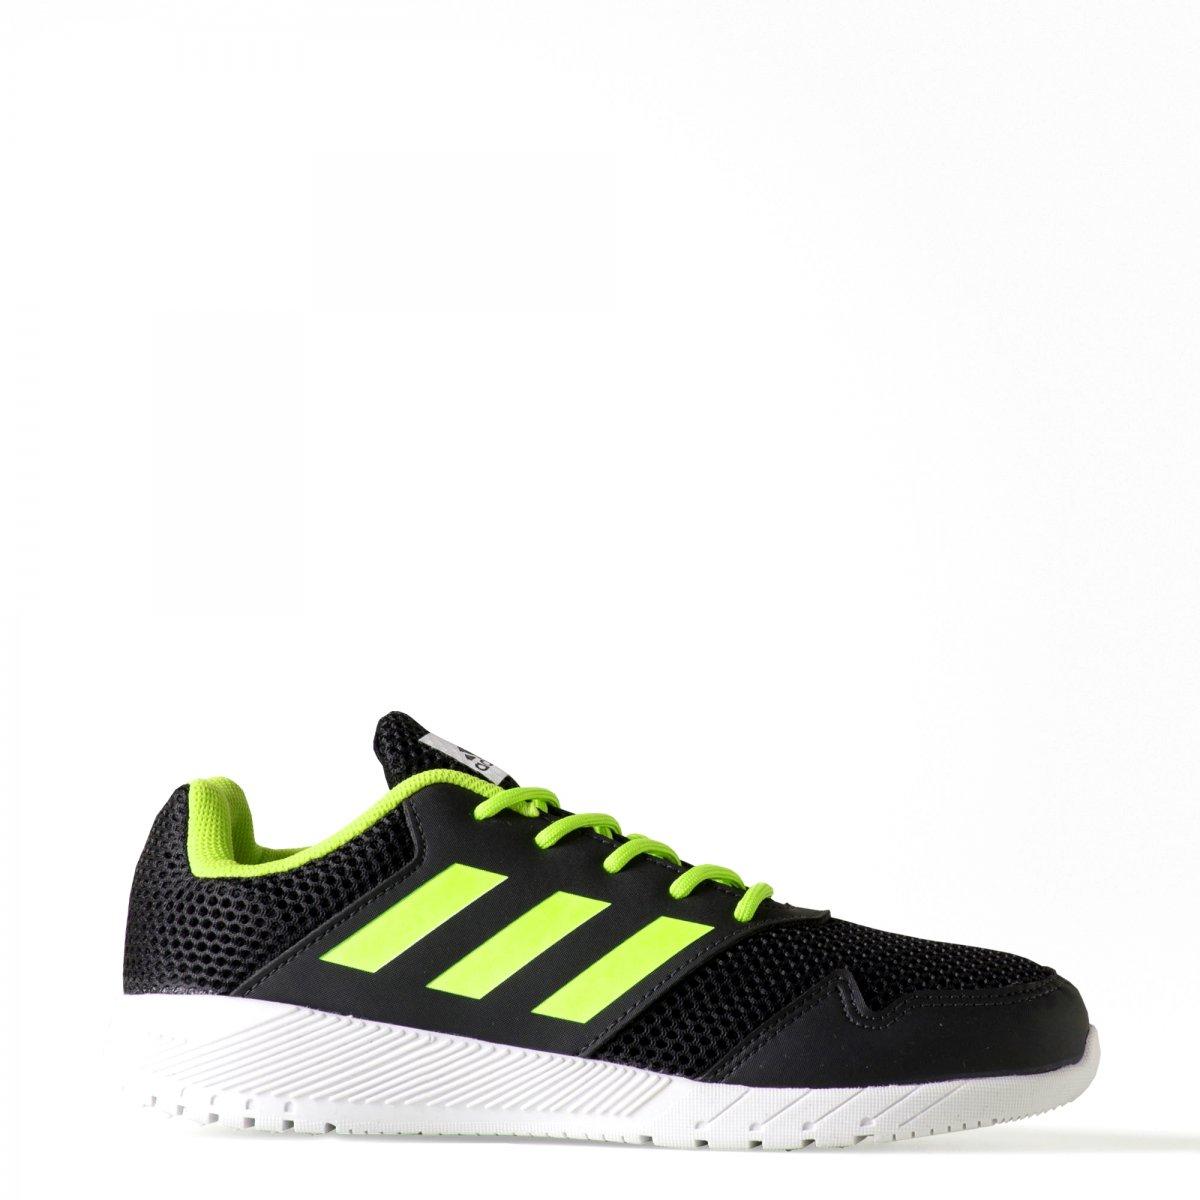 5bc4a8b9dea Tênis Infantil Adidas QuickRun Jr H68495 - Preto Verde - Calçados ...